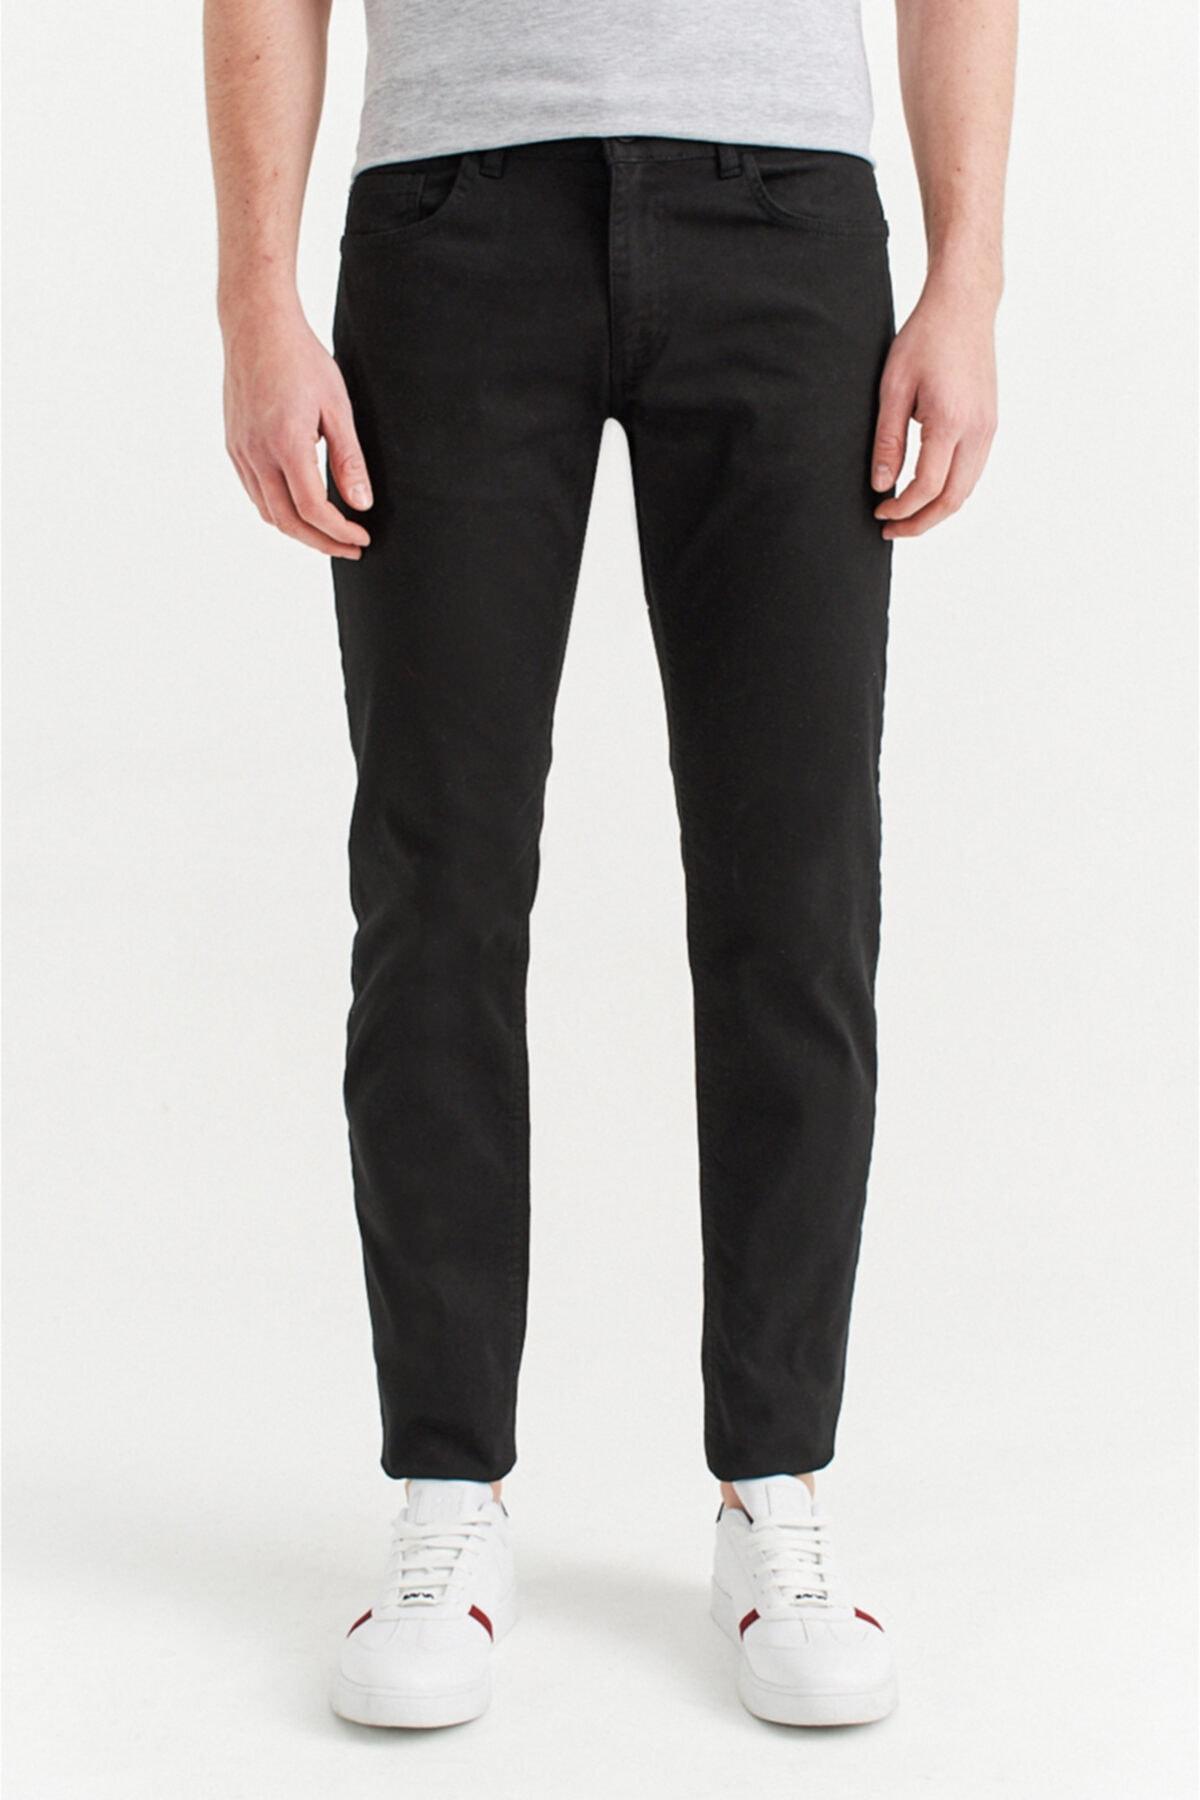 Avva Erkek Siyah 5 Cepli Armürlü Slim Fit Pantolon A92y3086 1